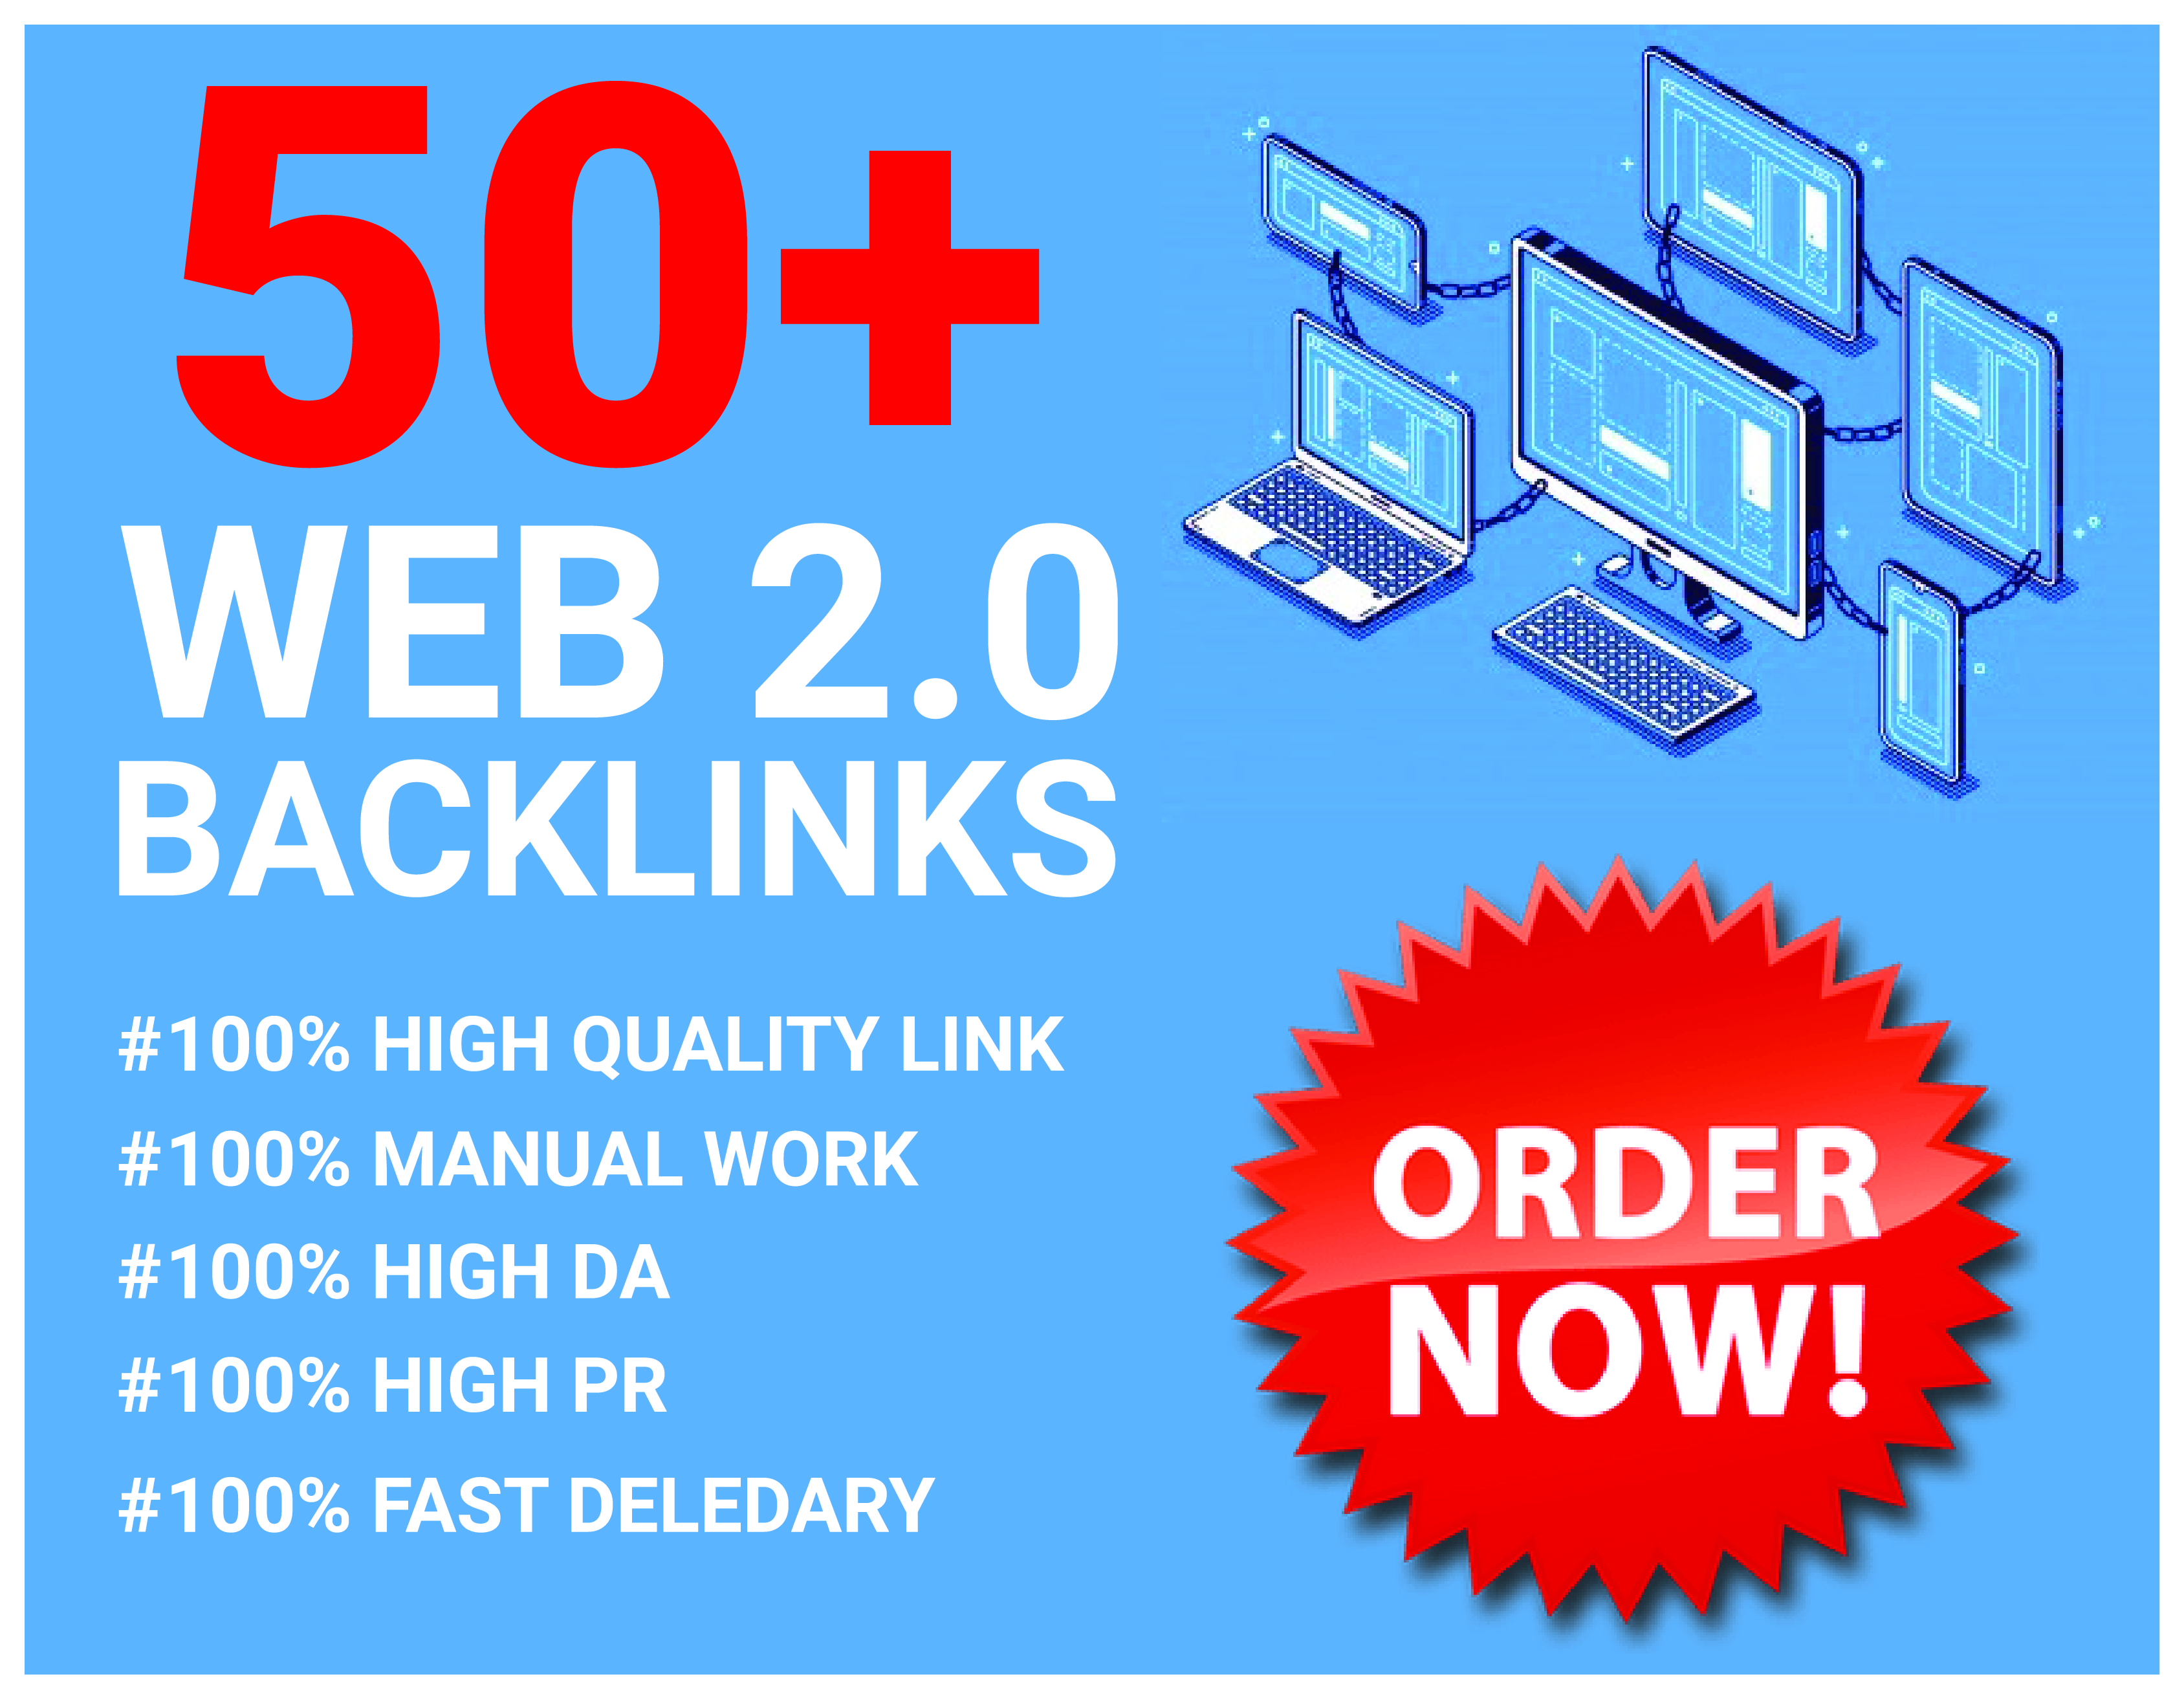 50+ Build Handmade Web 2.0 HIGH DA Manual Backlinks For Ranking On Google